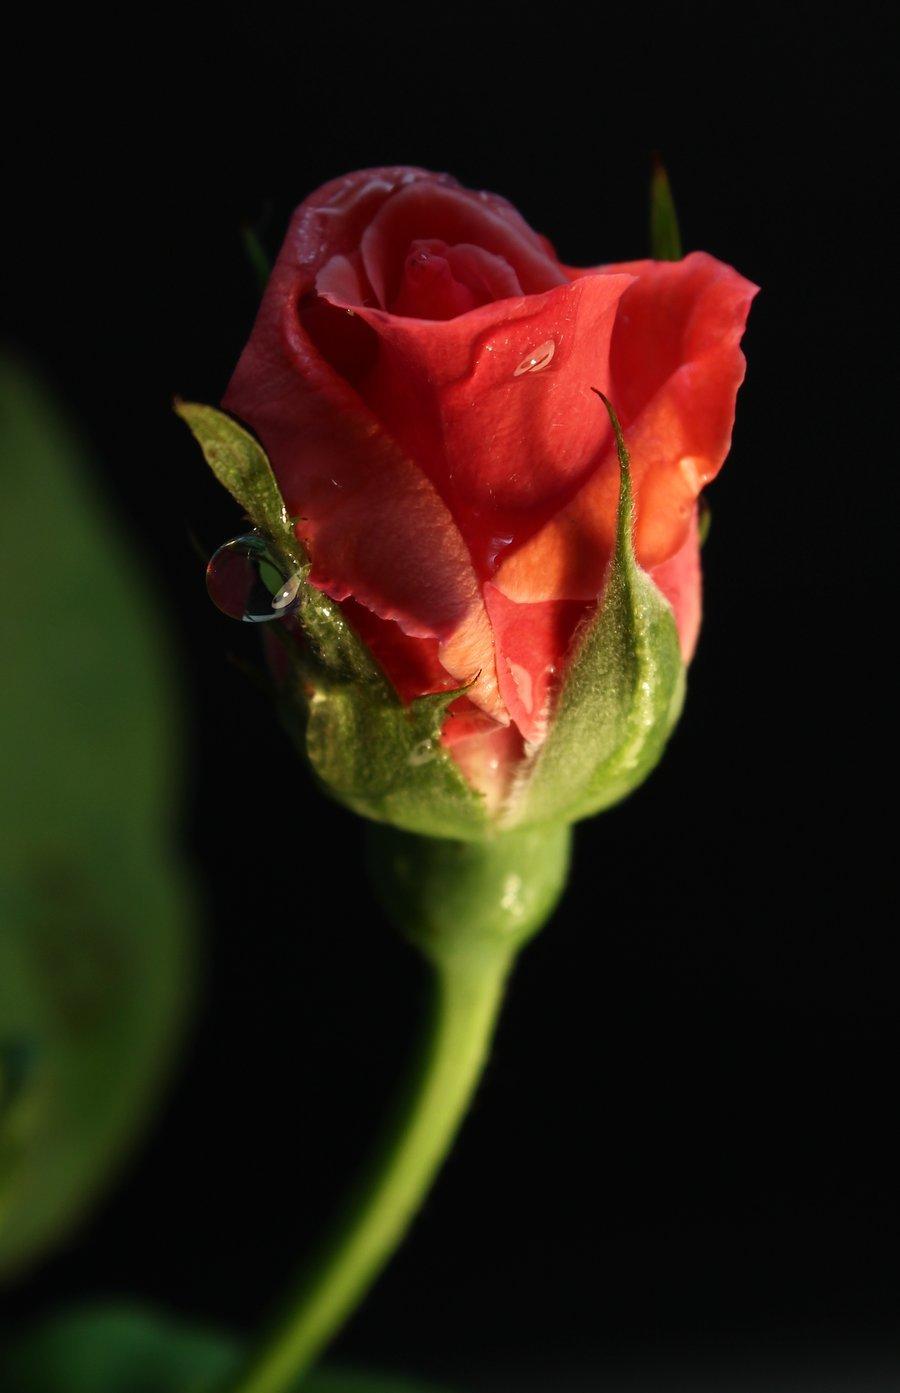 Samo jedan cvet Tumblr_m5yp9tBrAe1rqvwcoo1_1280